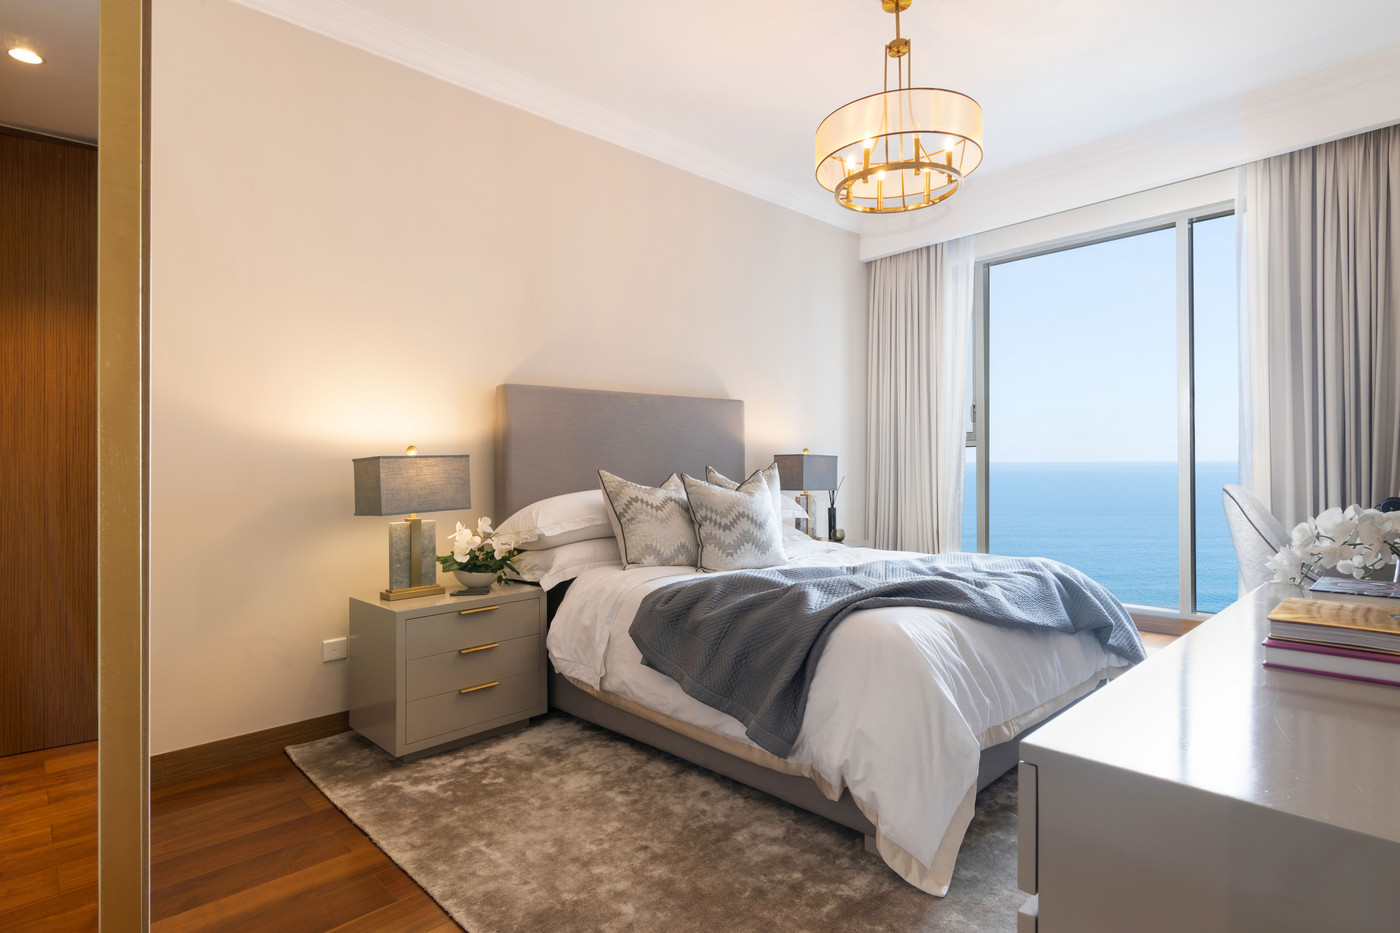 Bedroom Creative Heritage Interiors.jpg